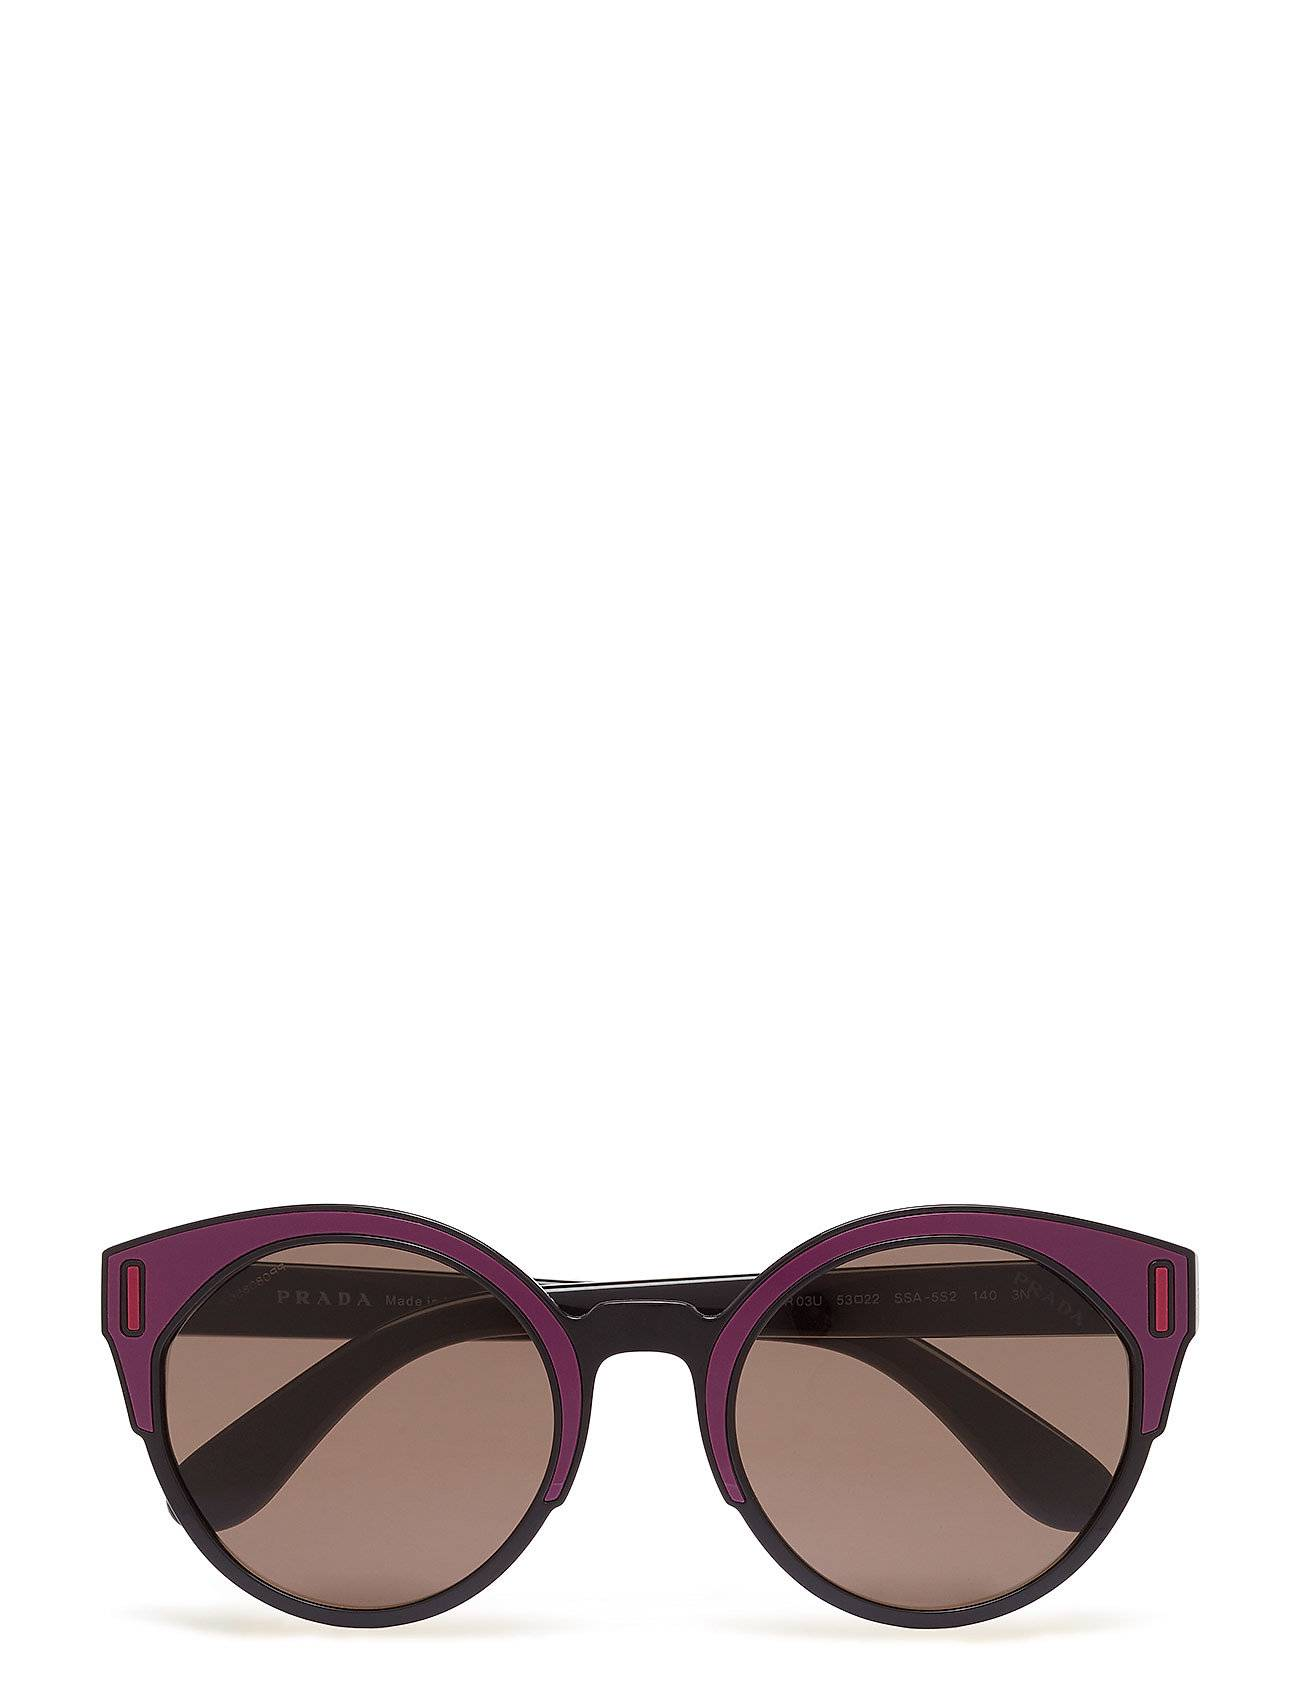 Image of Prada Sunglasses Women'S Sunglasses Aurinkolasit Liila Prada Sunglasses